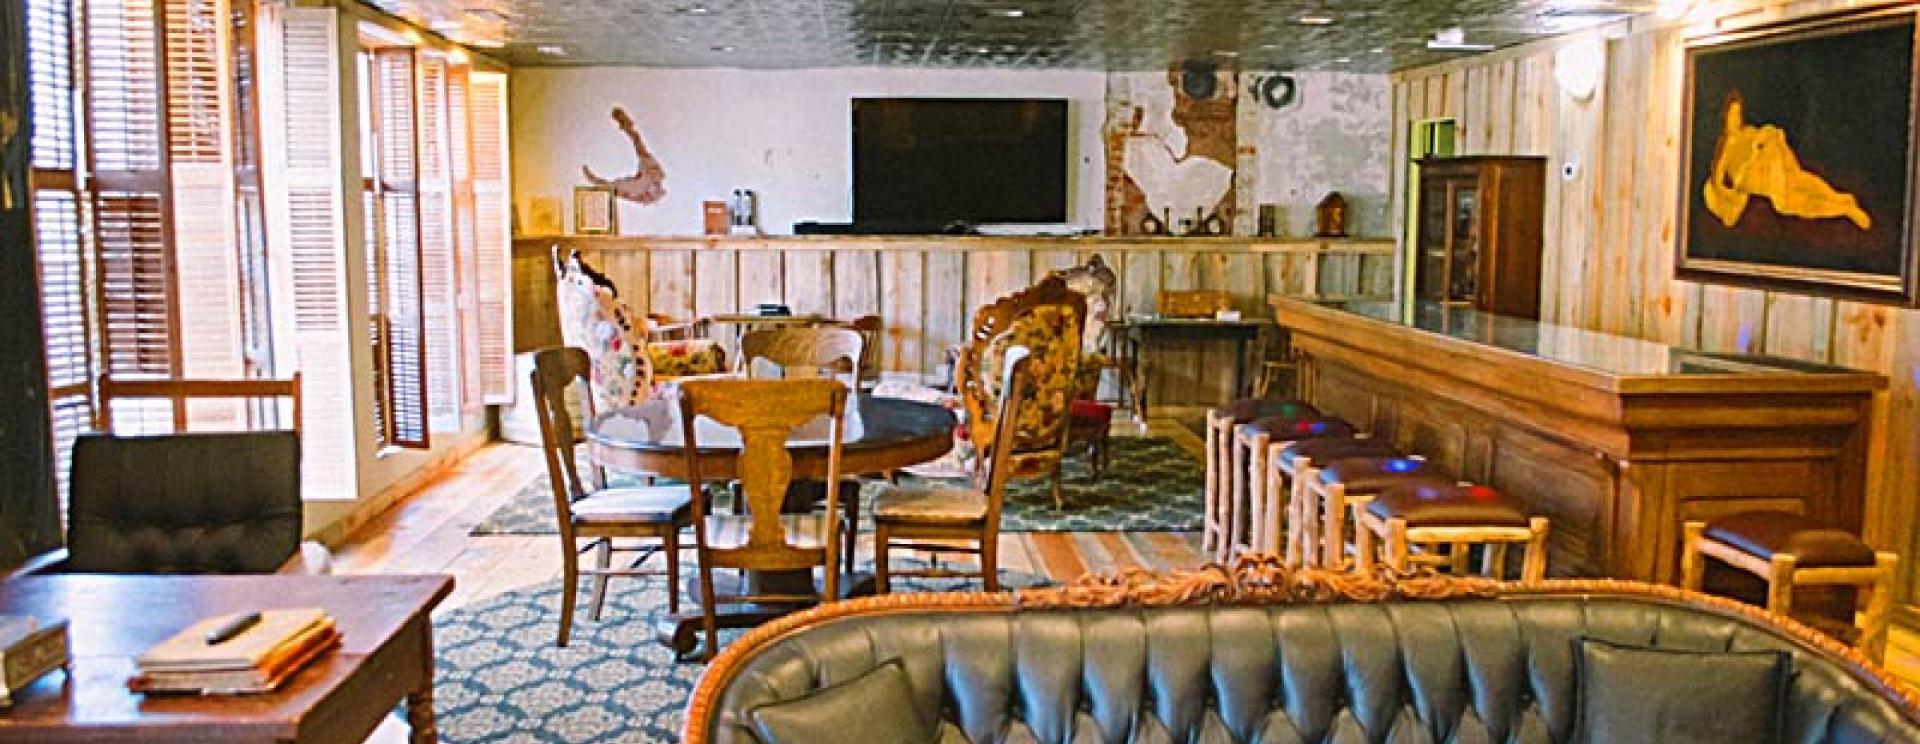 Deadwood Historic Brothel